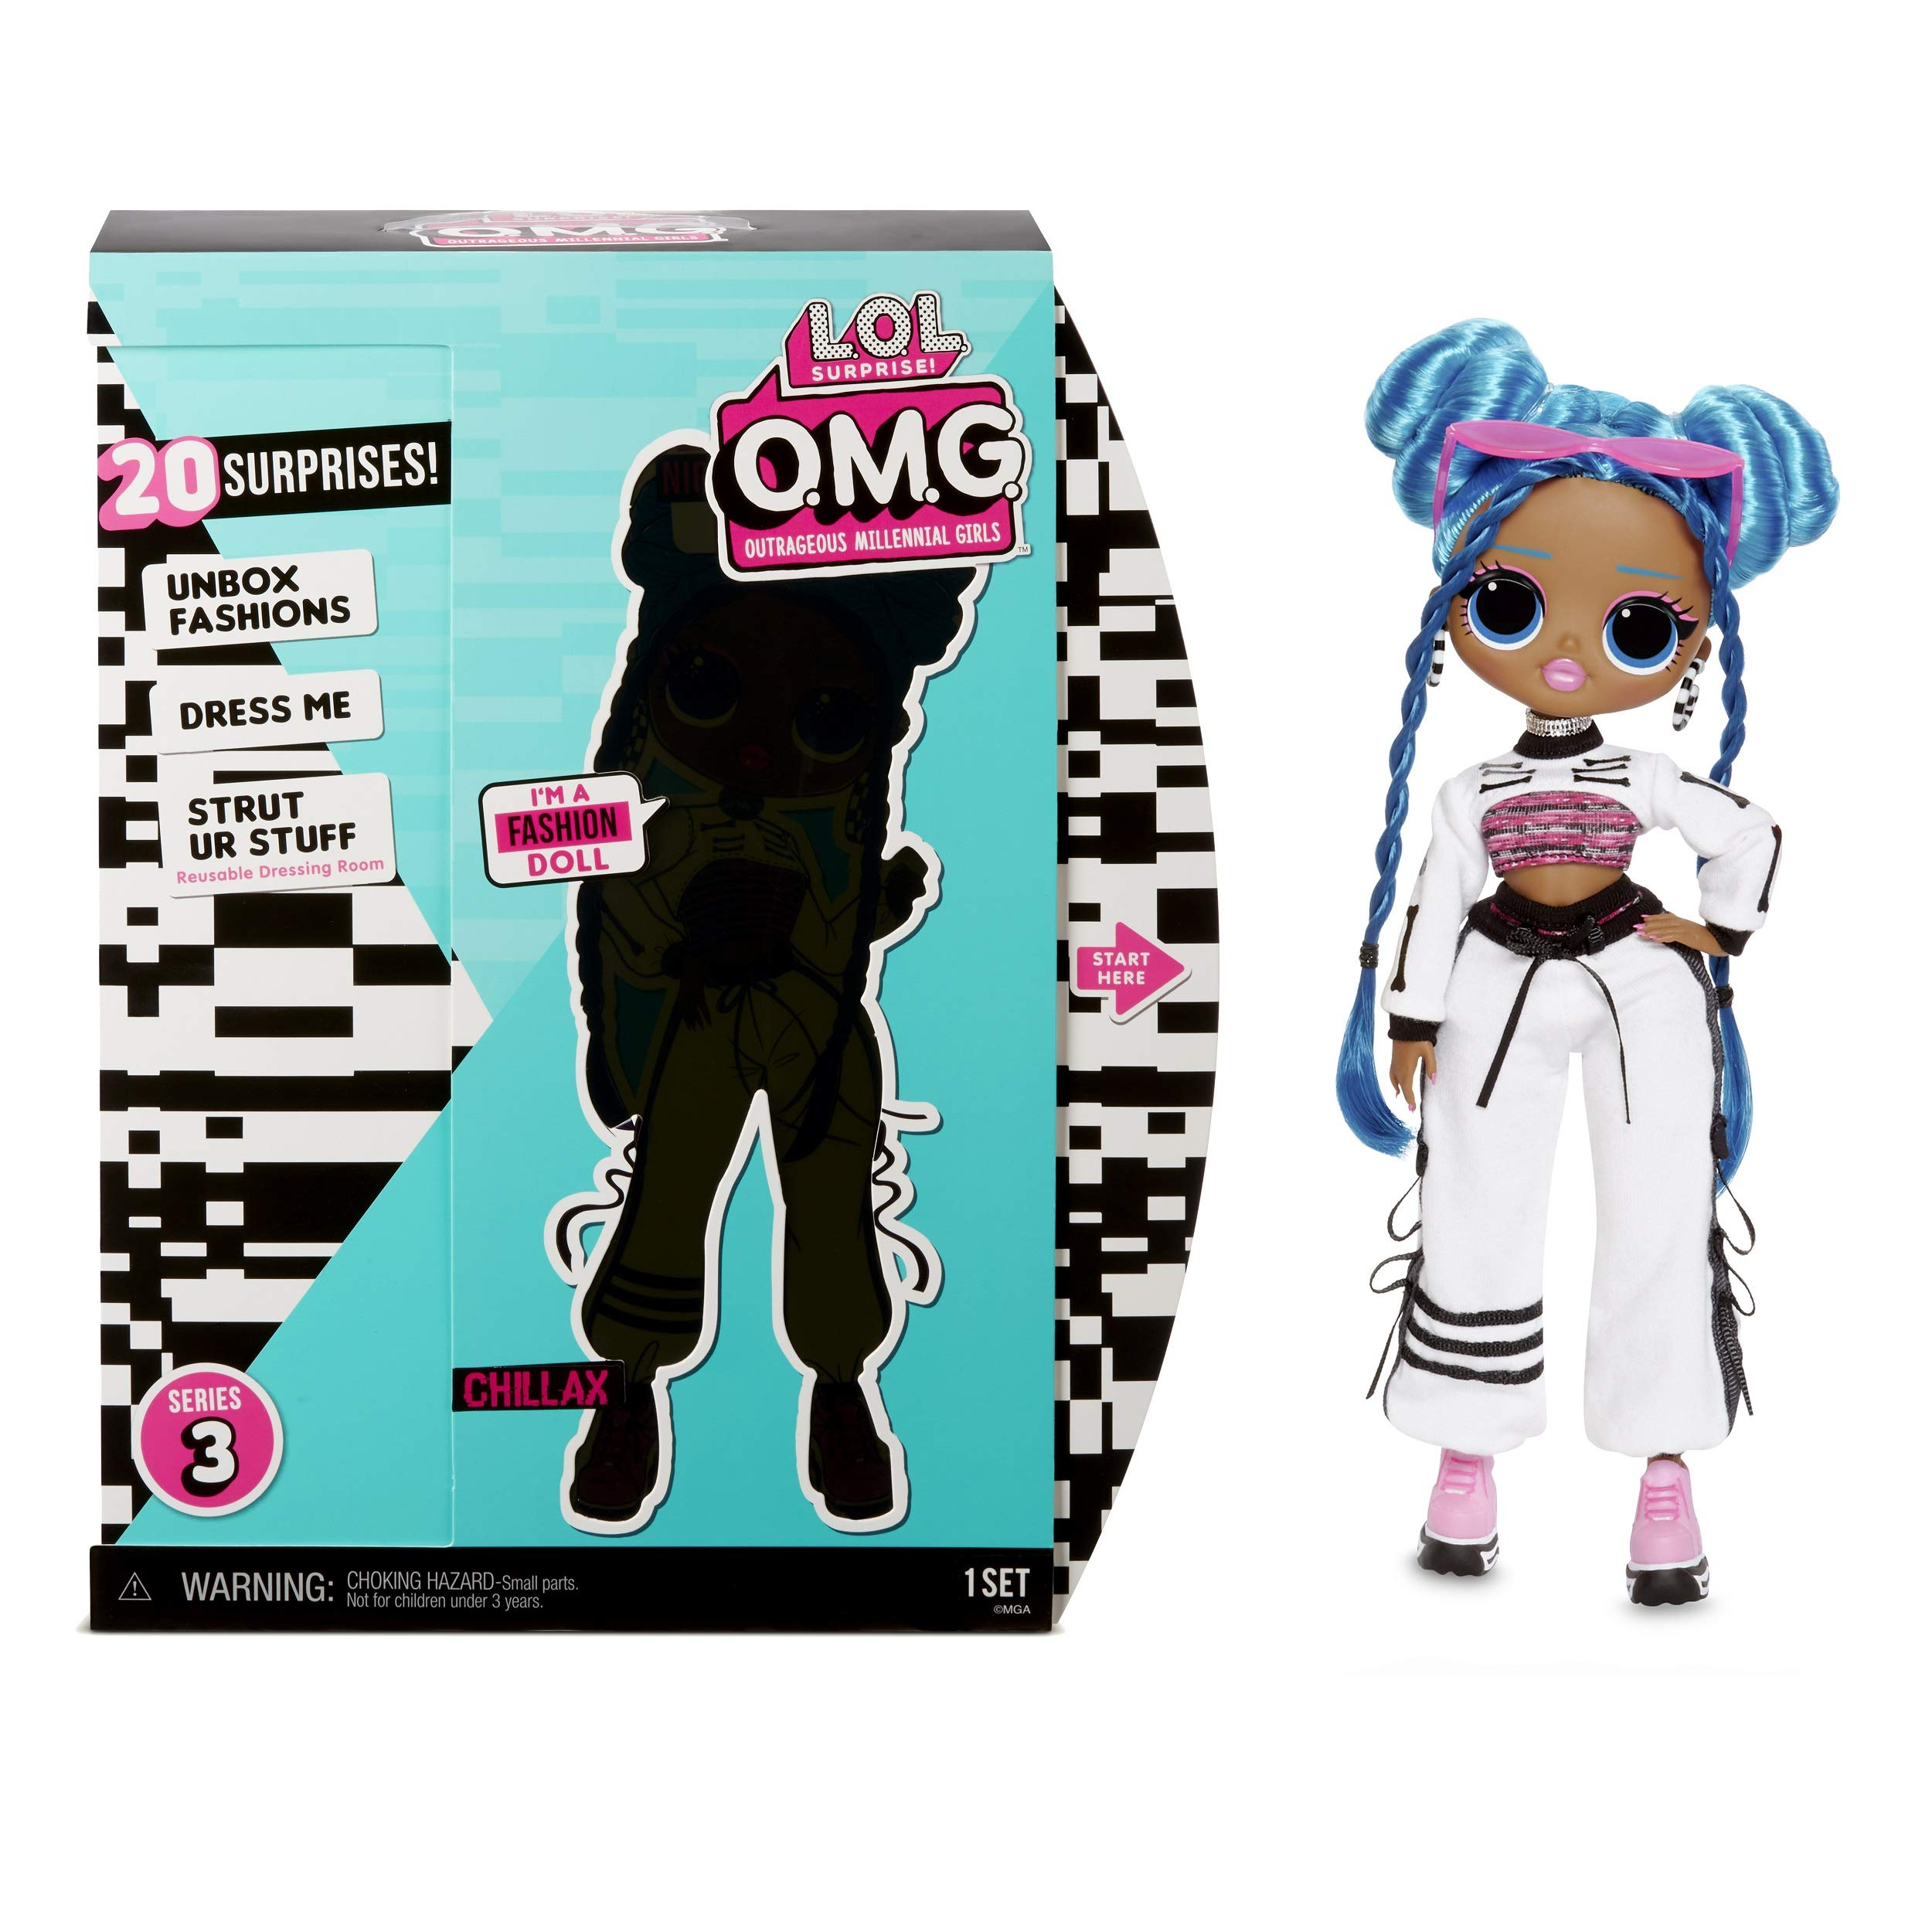 LOL 서프라이즈 OMG 시리즈 3 '칠렉스' 패션 인형 L.O.L. Surprise! O.M.G. Series 3 Chillax Fashion Doll with 20 Surprises